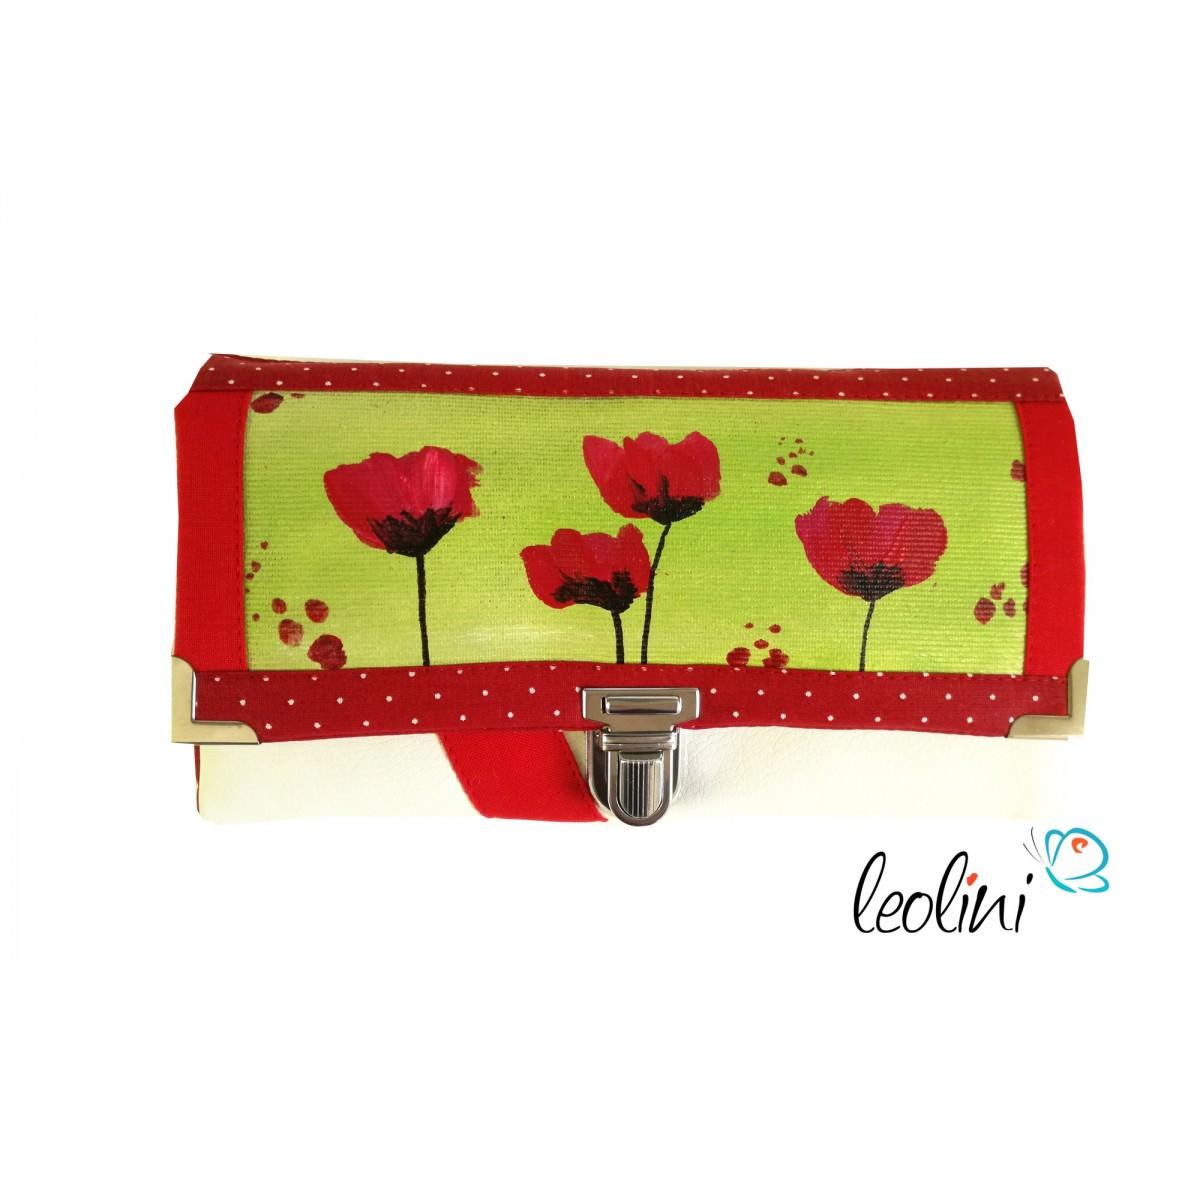 Große Malereigeldbörse - Damengeldbörse mit rotem Mohn - Portemonnaie